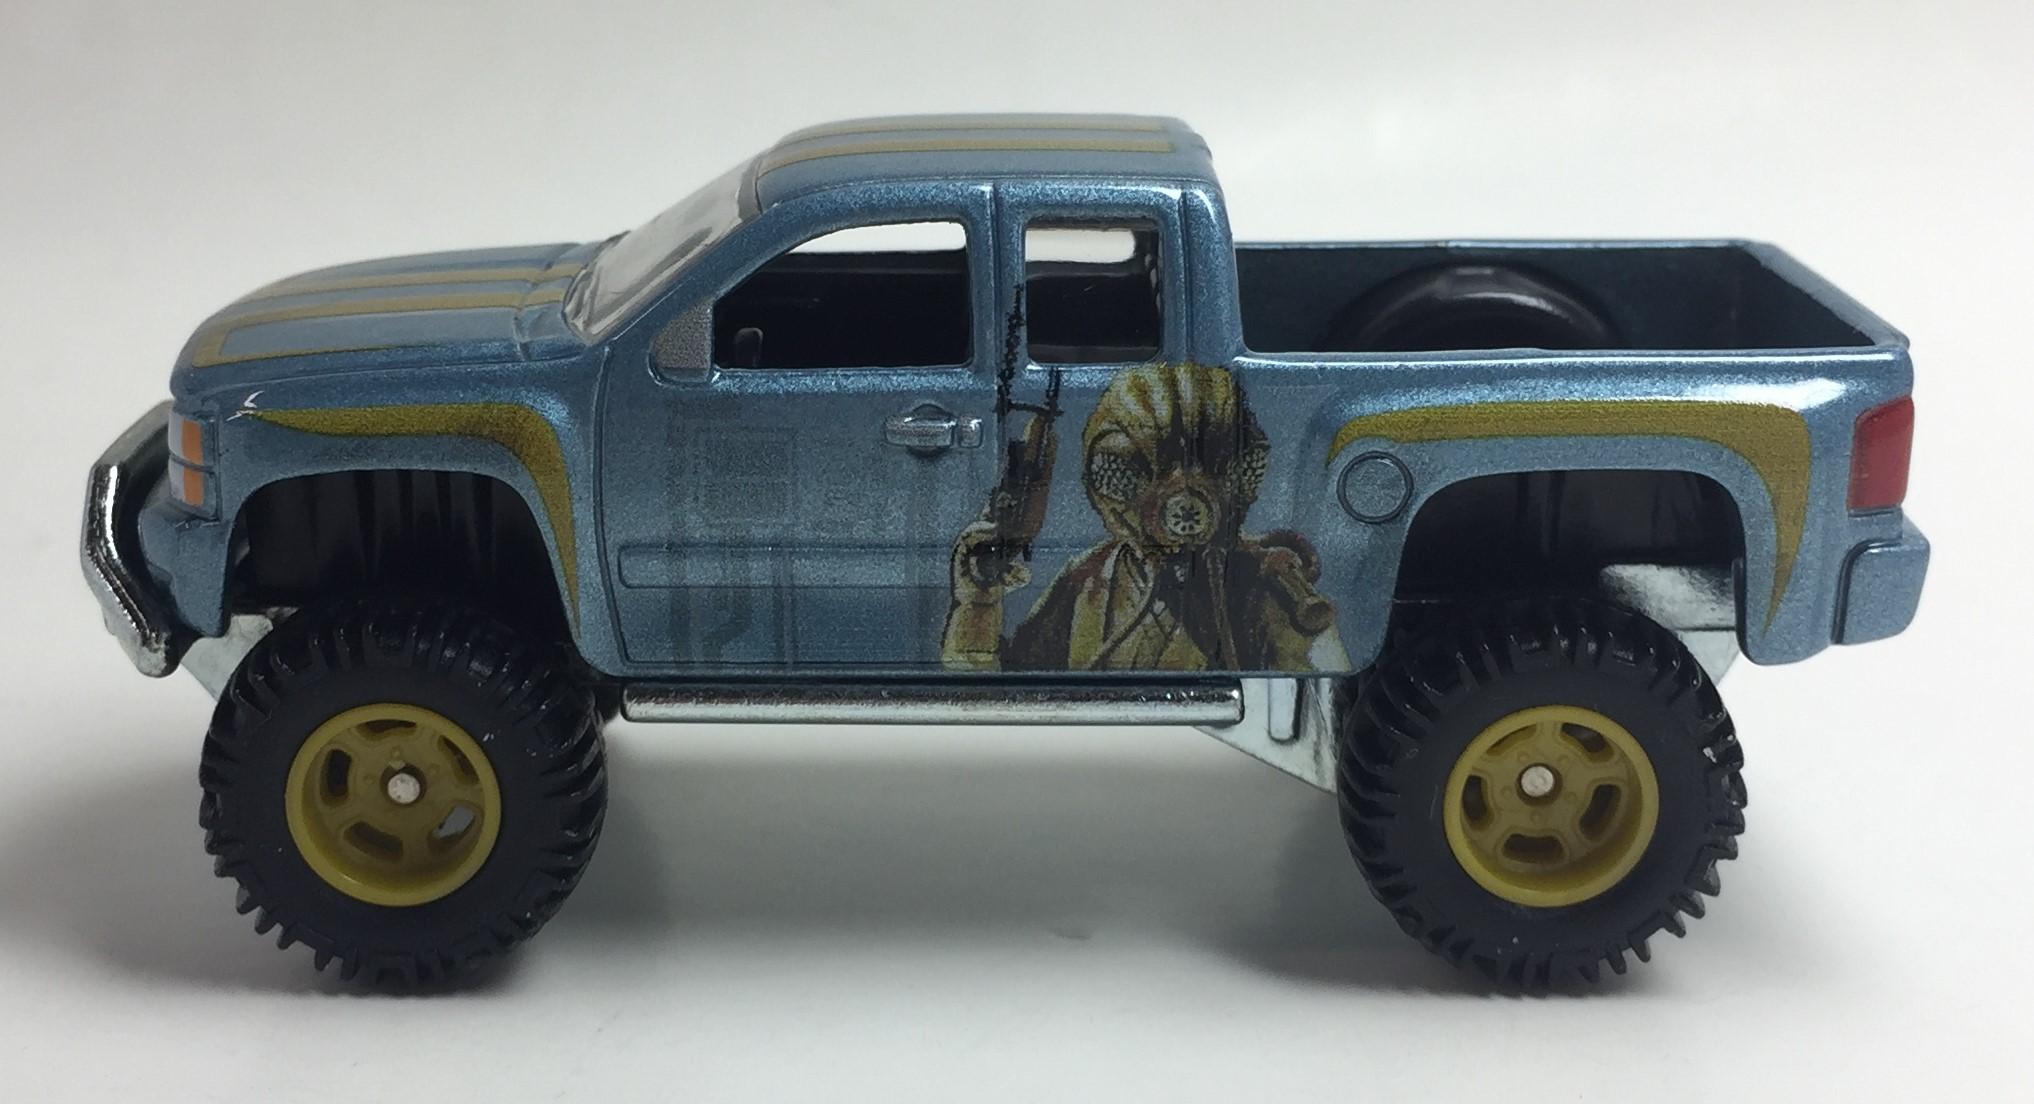 Chevy Silverado OffRoad Bounty Hunters4.jpg